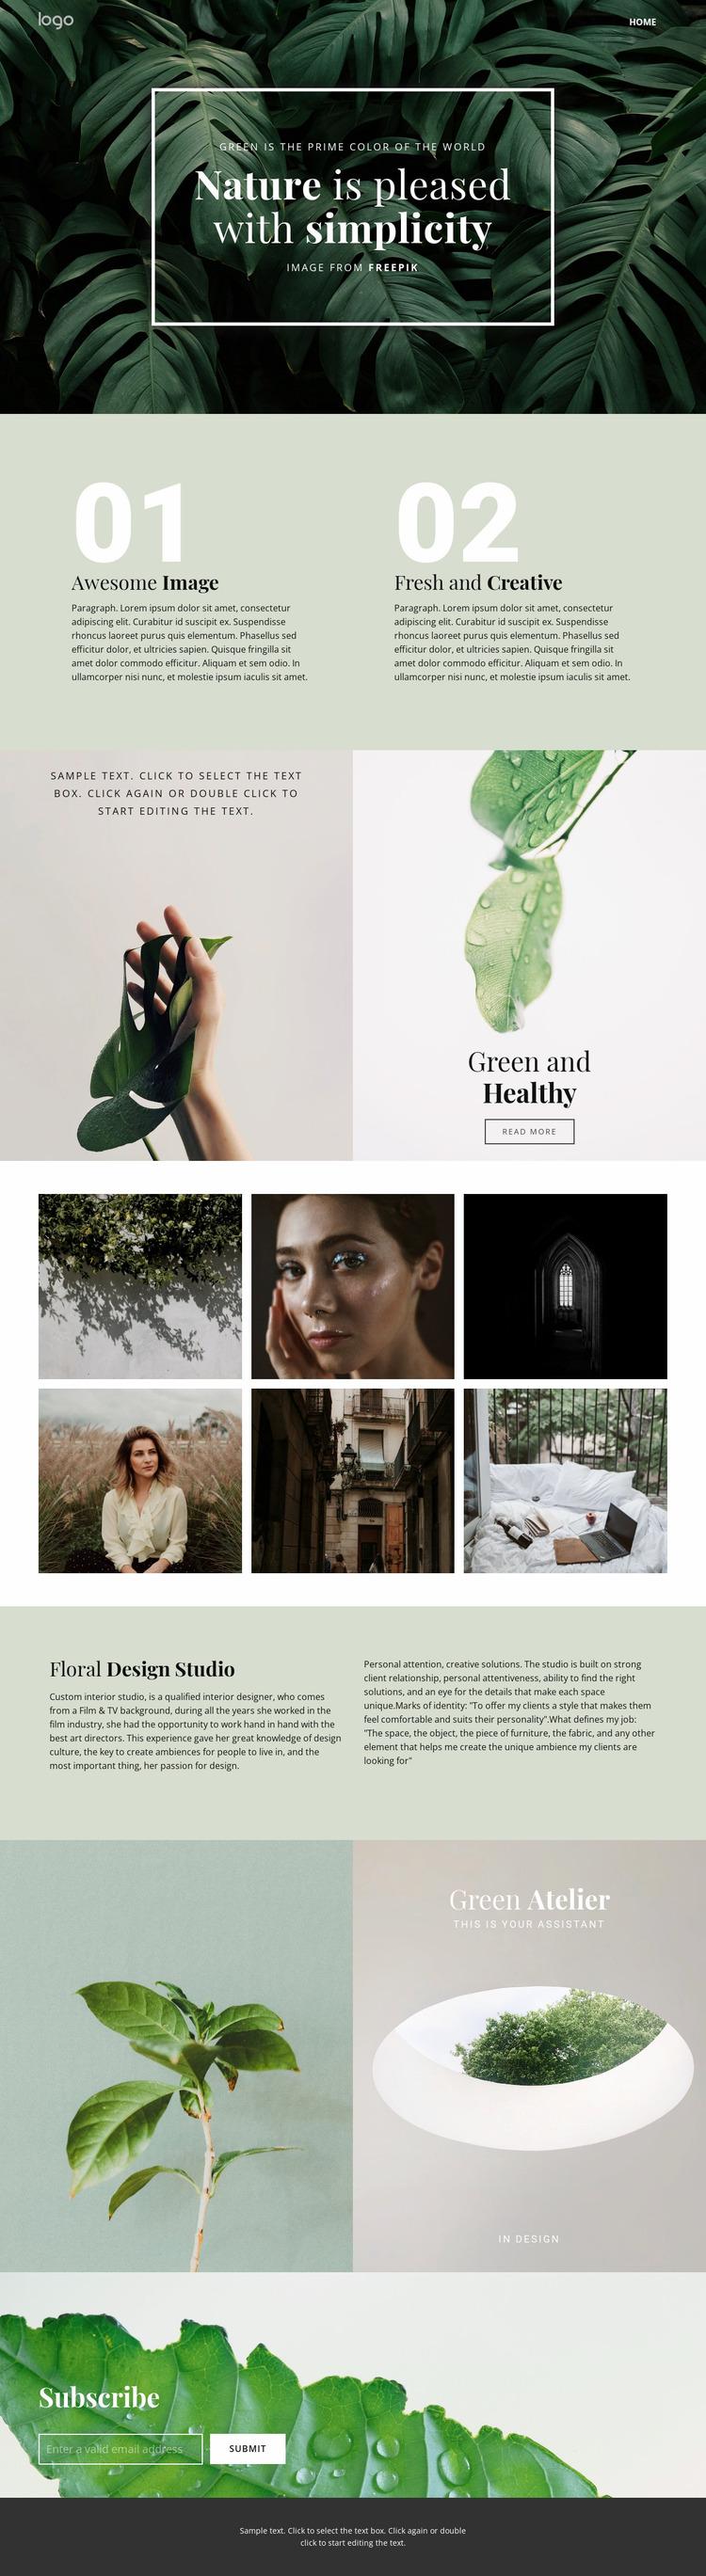 Beauty simplicity of nature Website Mockup